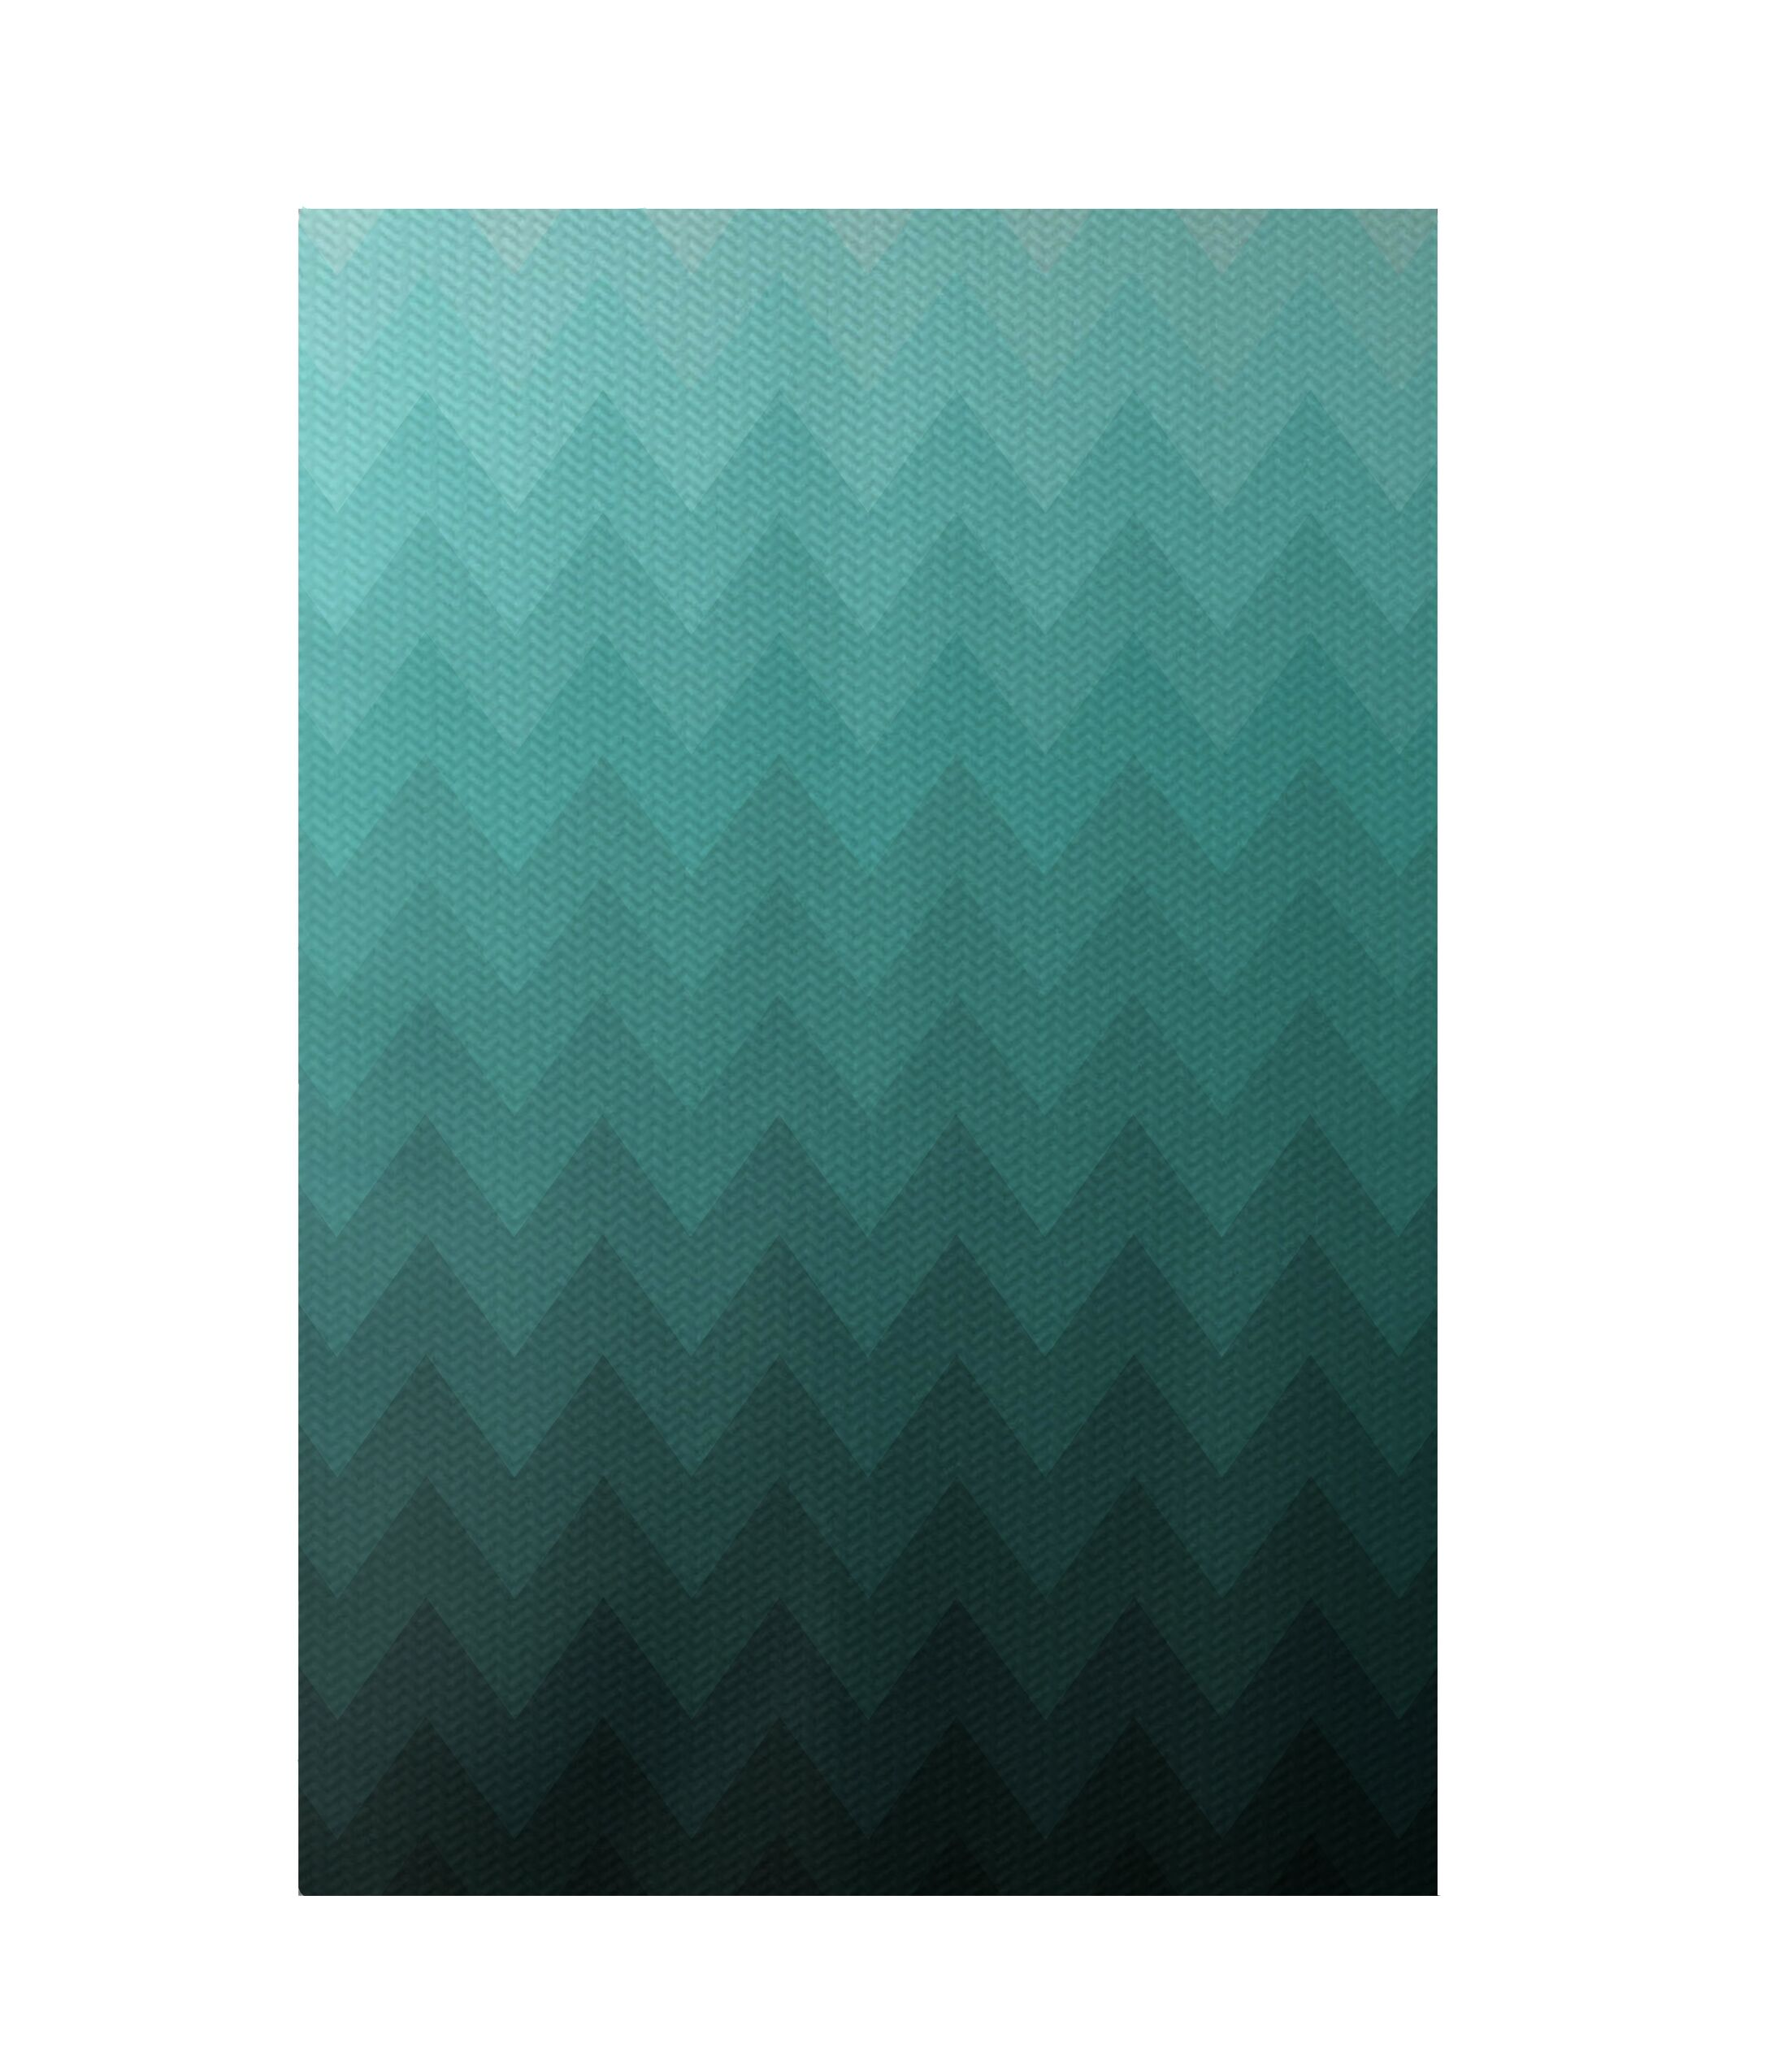 Chevron Aqua Indoor/Outdoor Area Rug Rug Size: Rectangle 2' x 3'